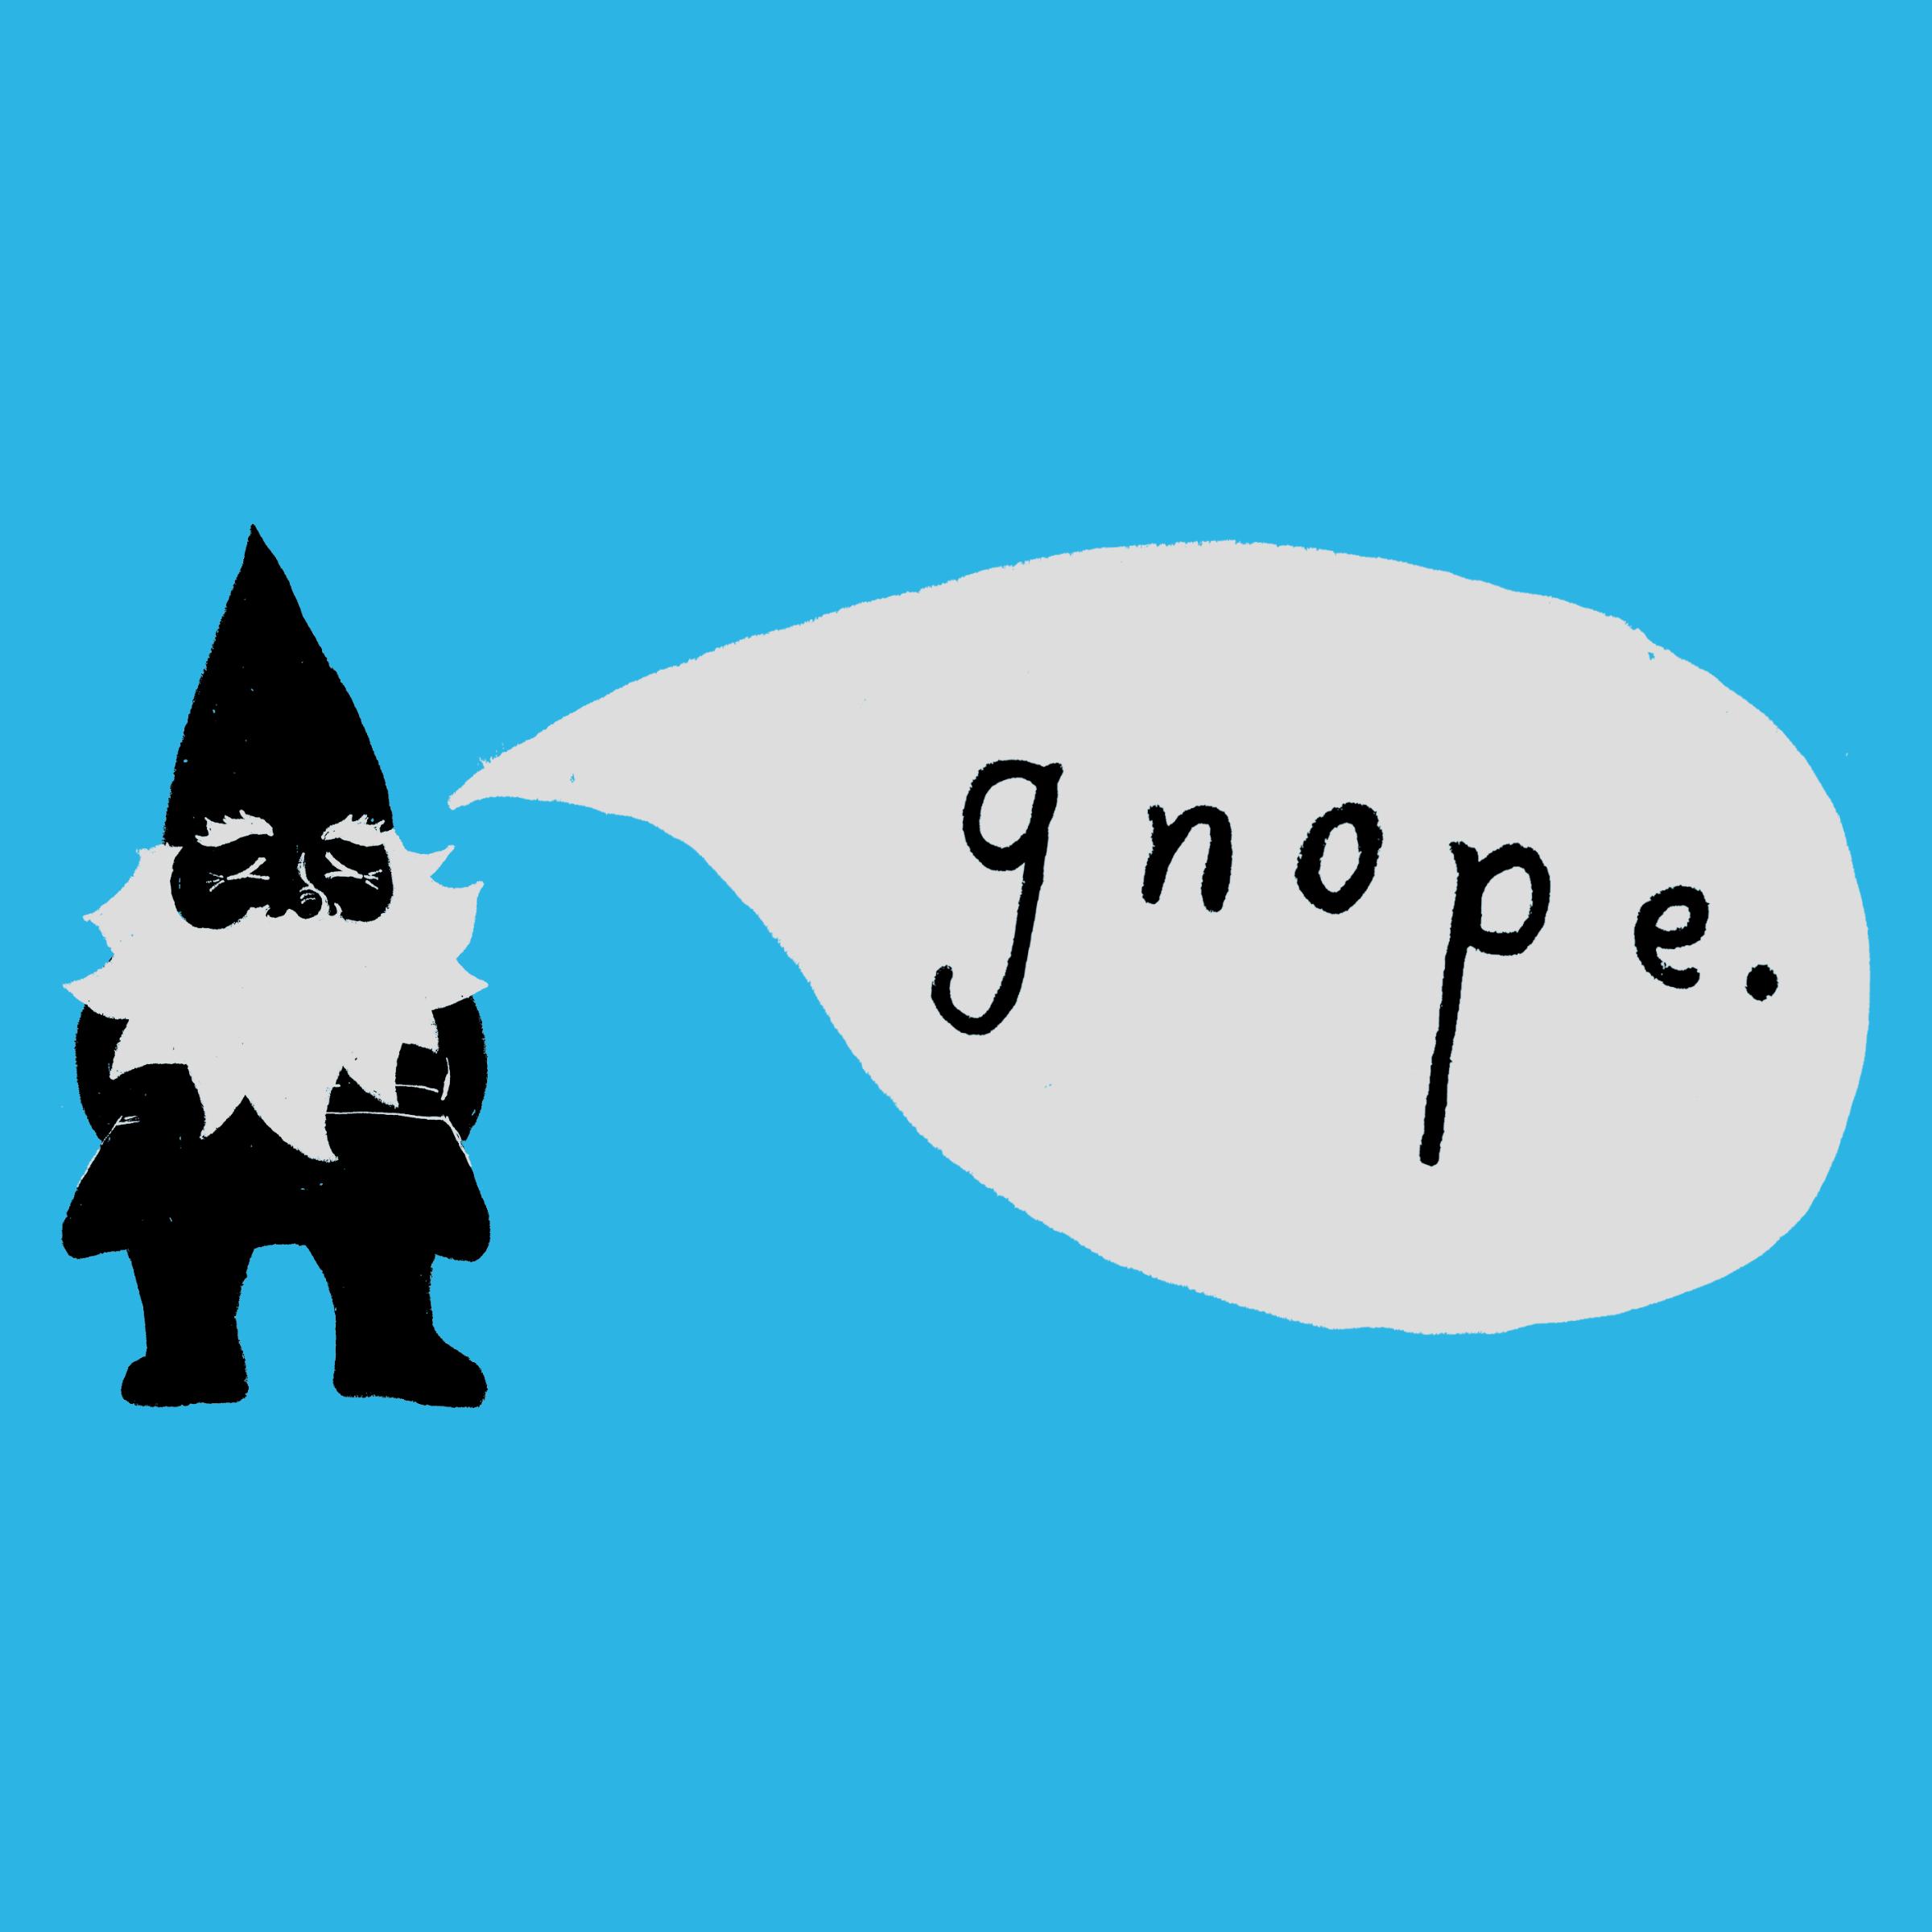 Gnope